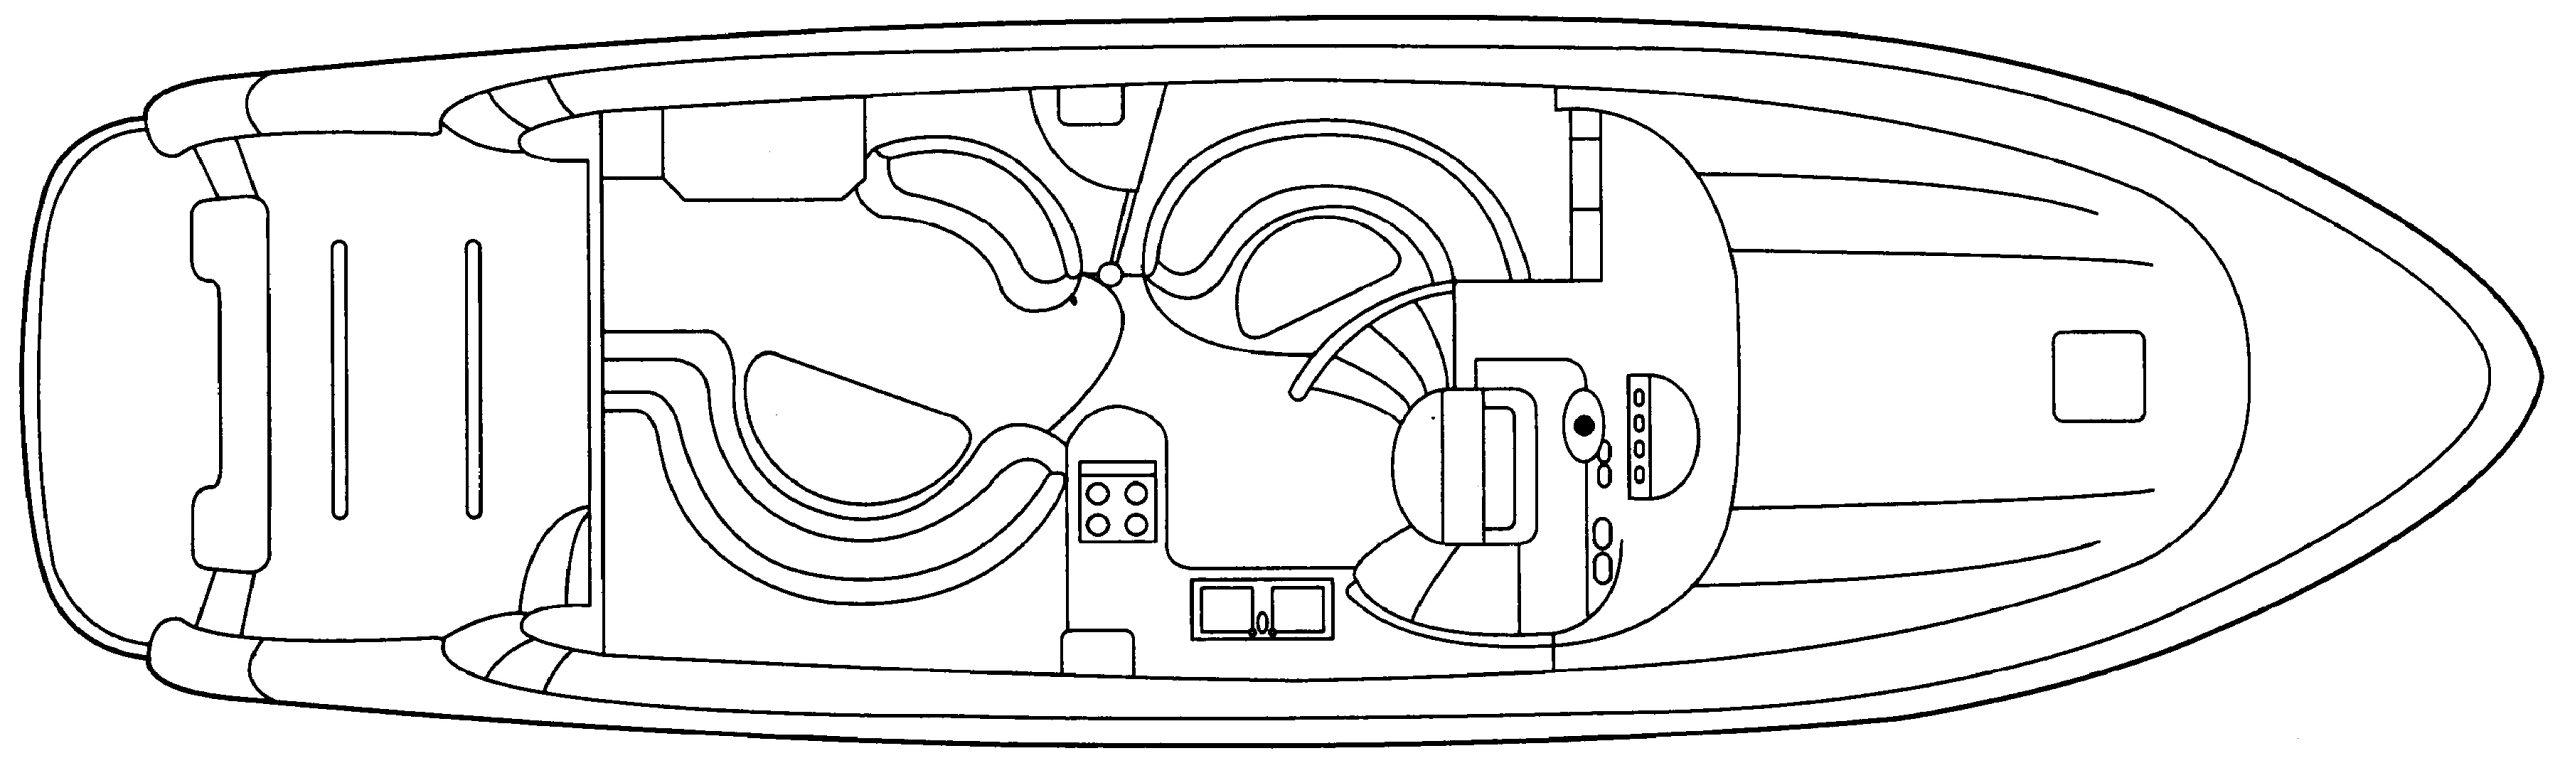 T51 Motor Yacht Floor Plan 2